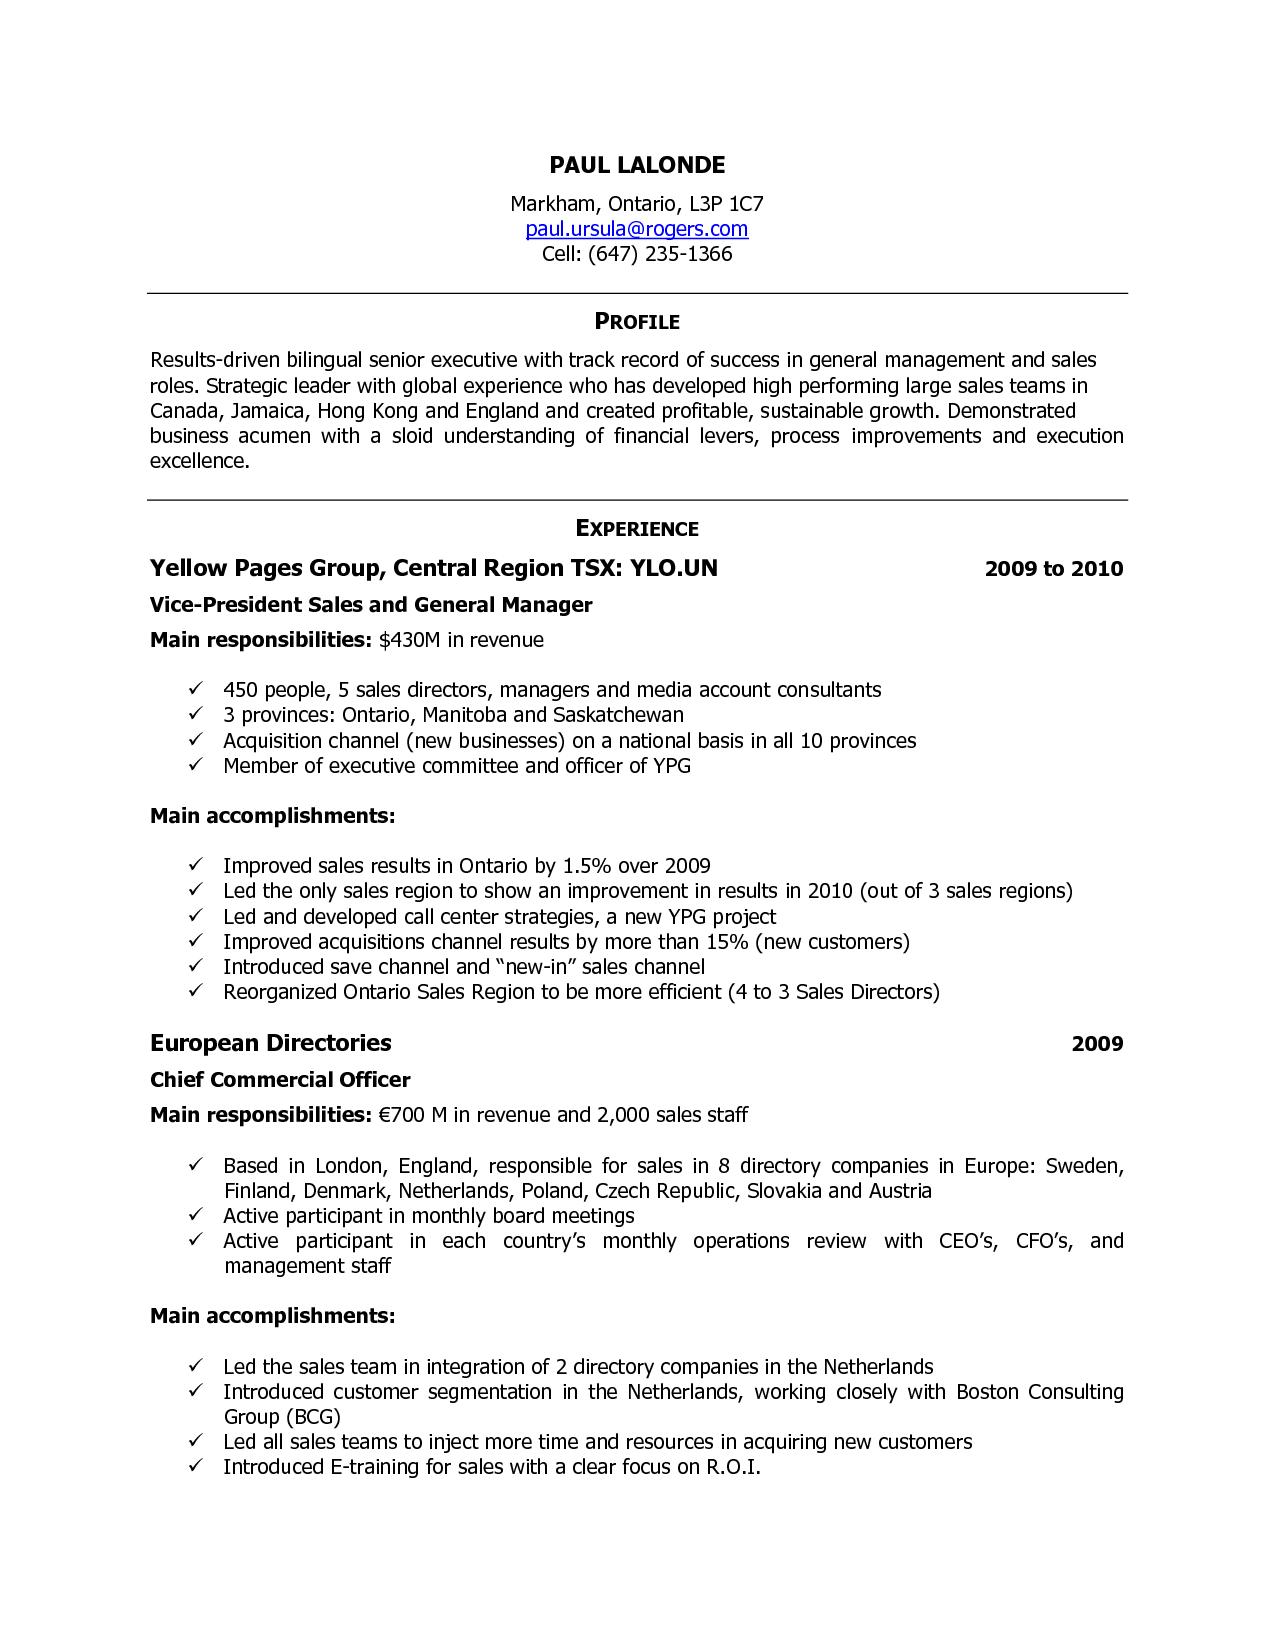 format of cv in canada